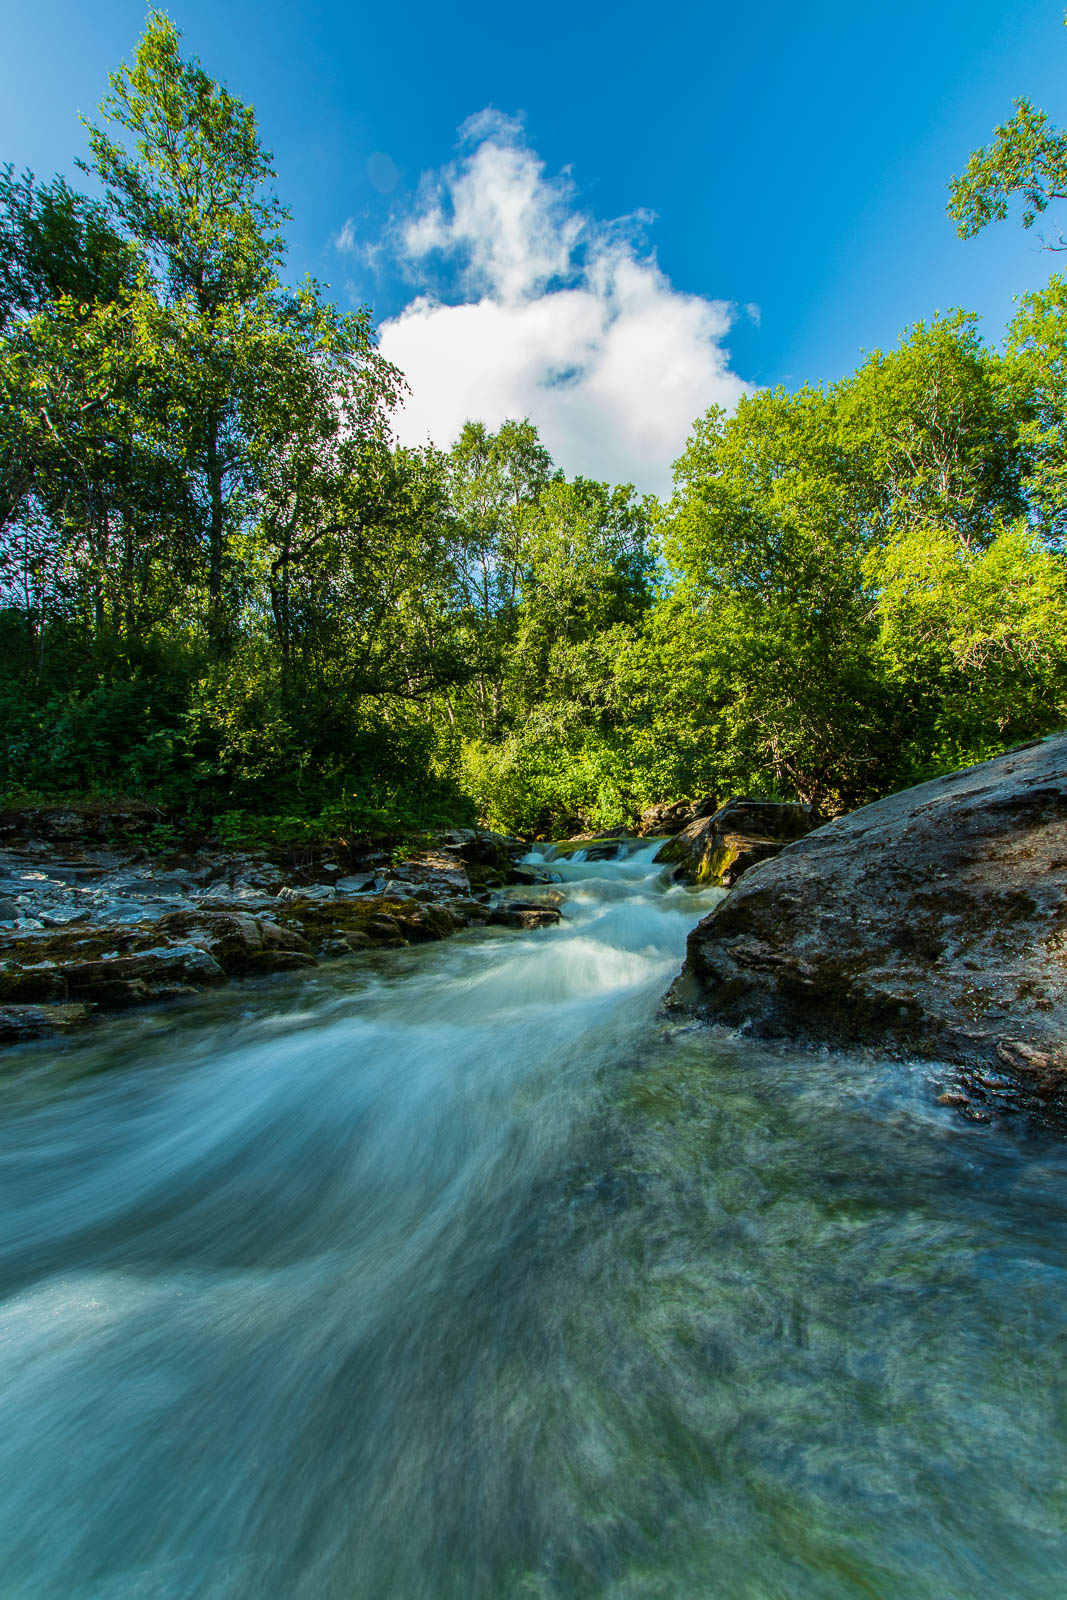 Long exposure - The River - Copyright Trygve Selmer